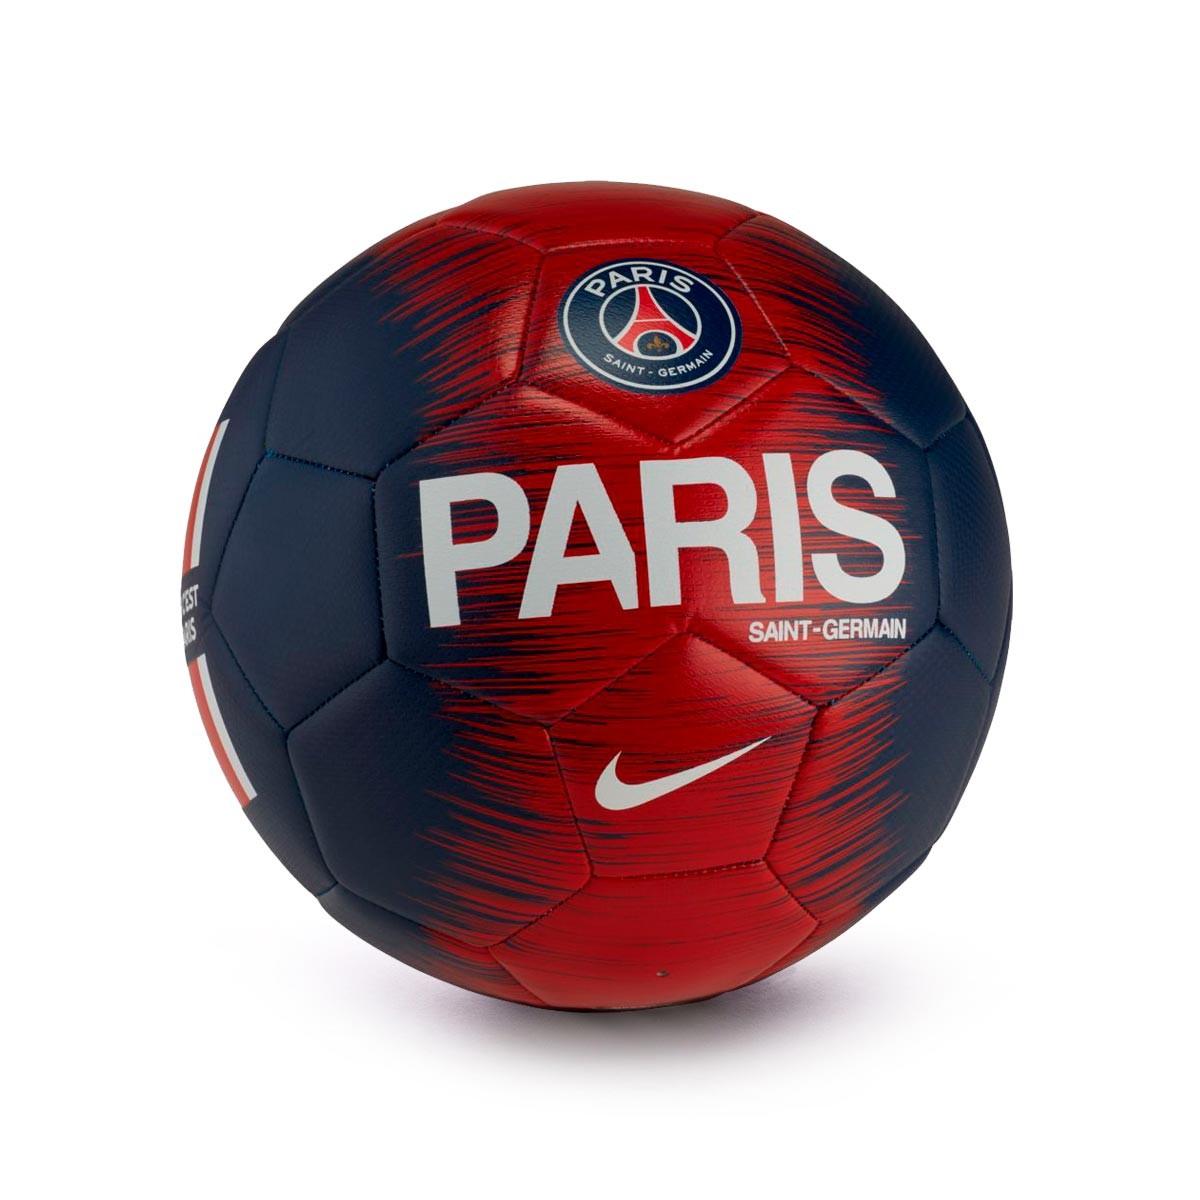 Ball Nike Paris Saint-Germain Prestige 2018-2019 Loyal blue-Challenge  red-White - Soloporteros es ahora Fútbol Emotion 8ace7272ea5d5